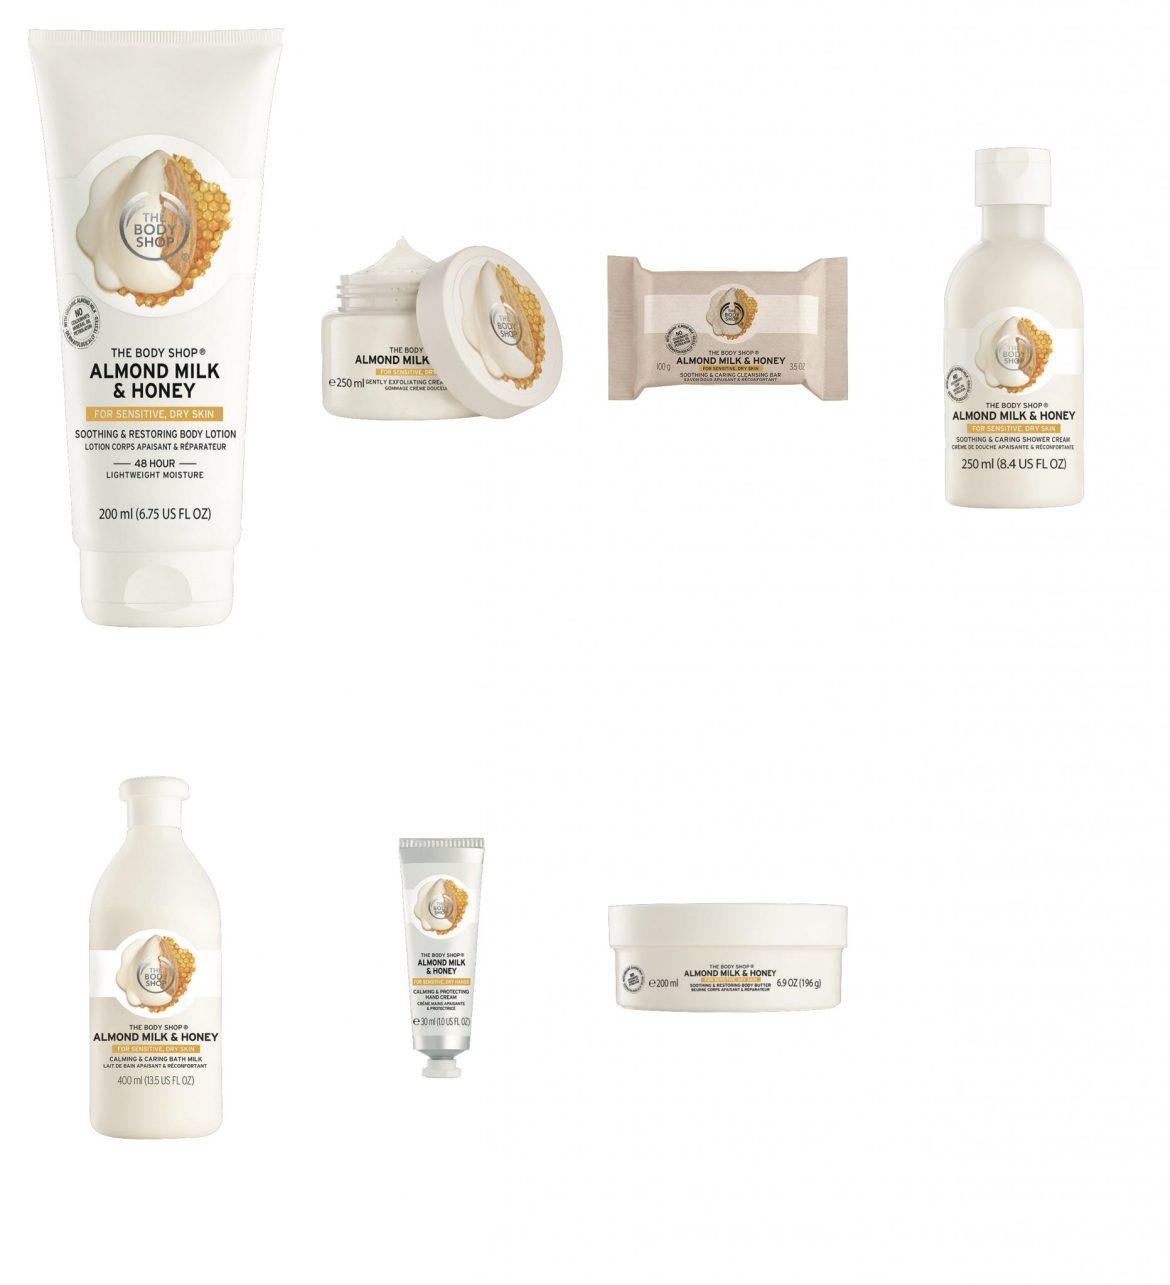 The Body Shop Almond Milk & Honey